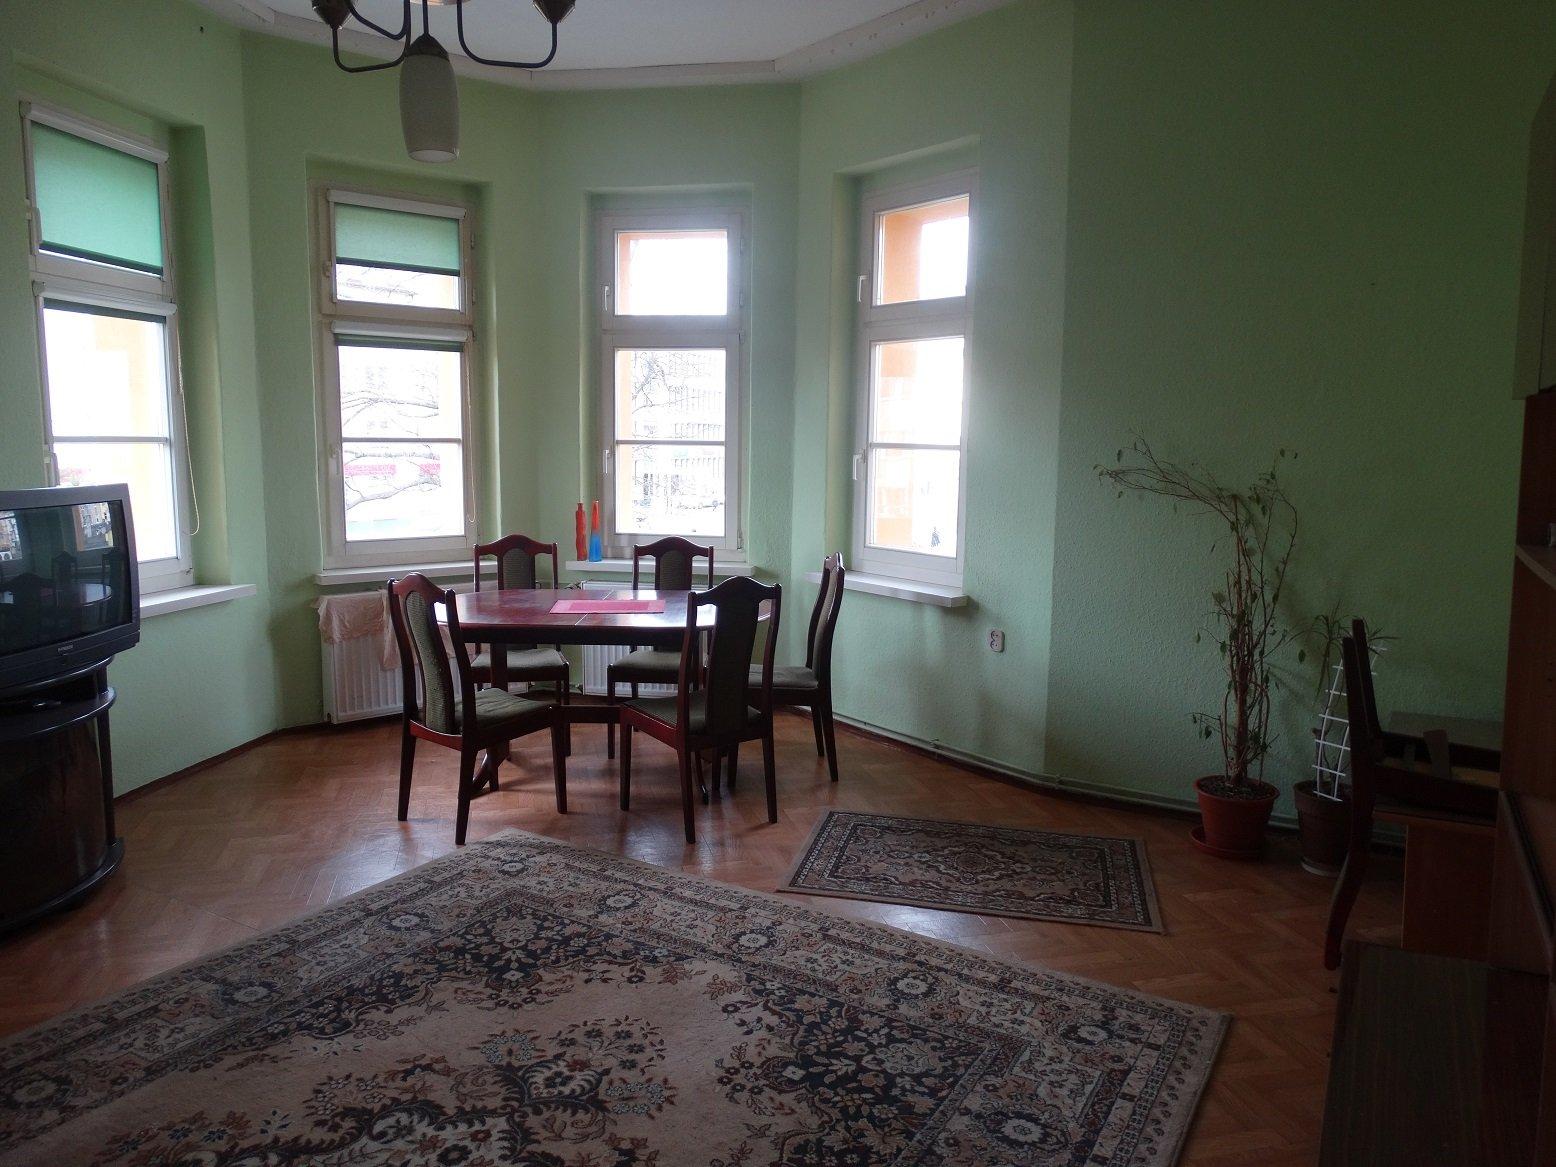 Mieszkanie, 65 m2, Opole - Centrum